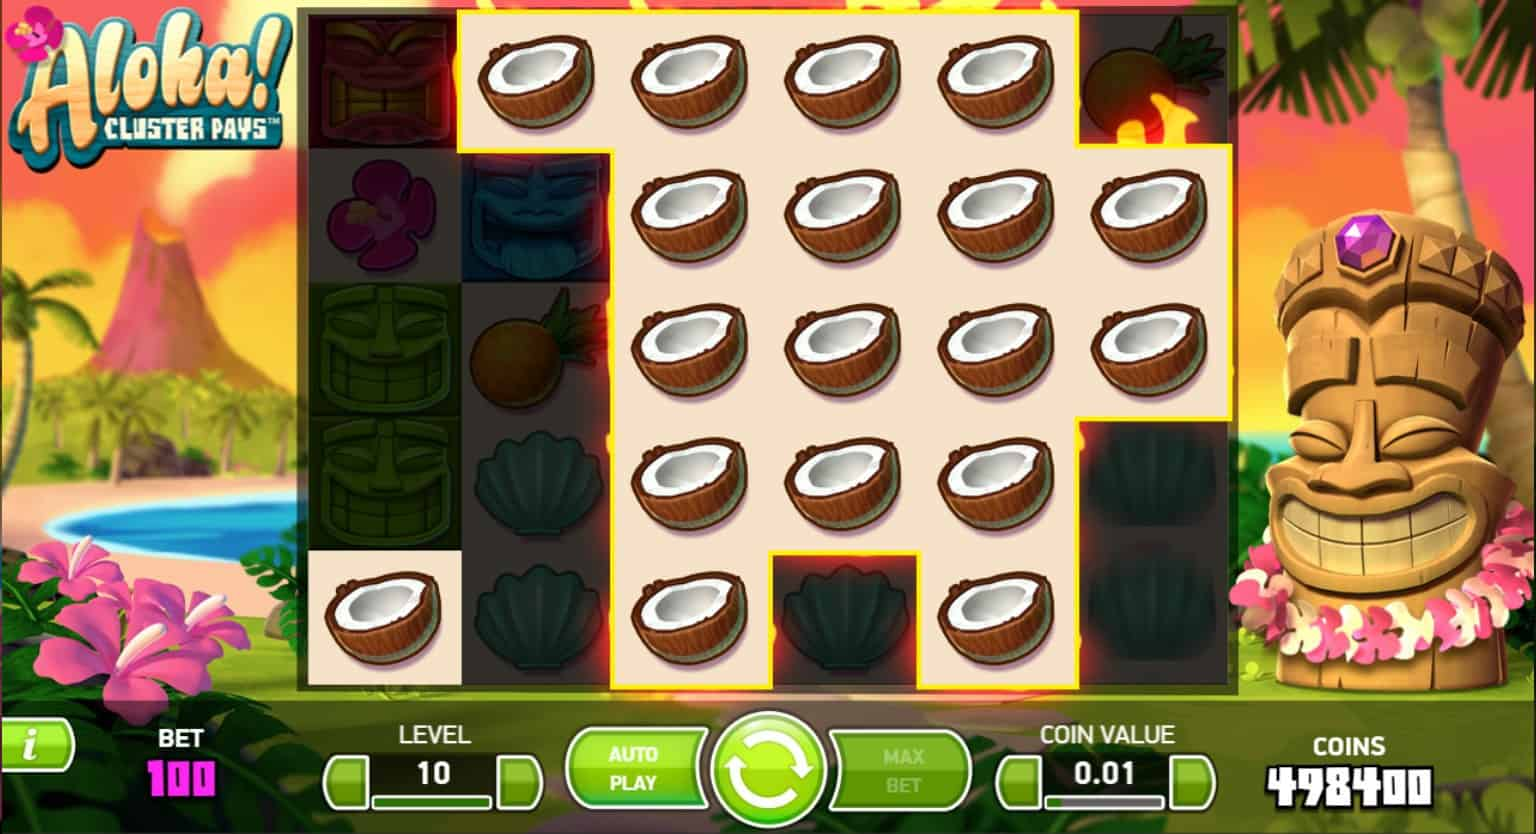 netent - aloha cluster pays - sticky win respin 2 - casinogroundsdotcom